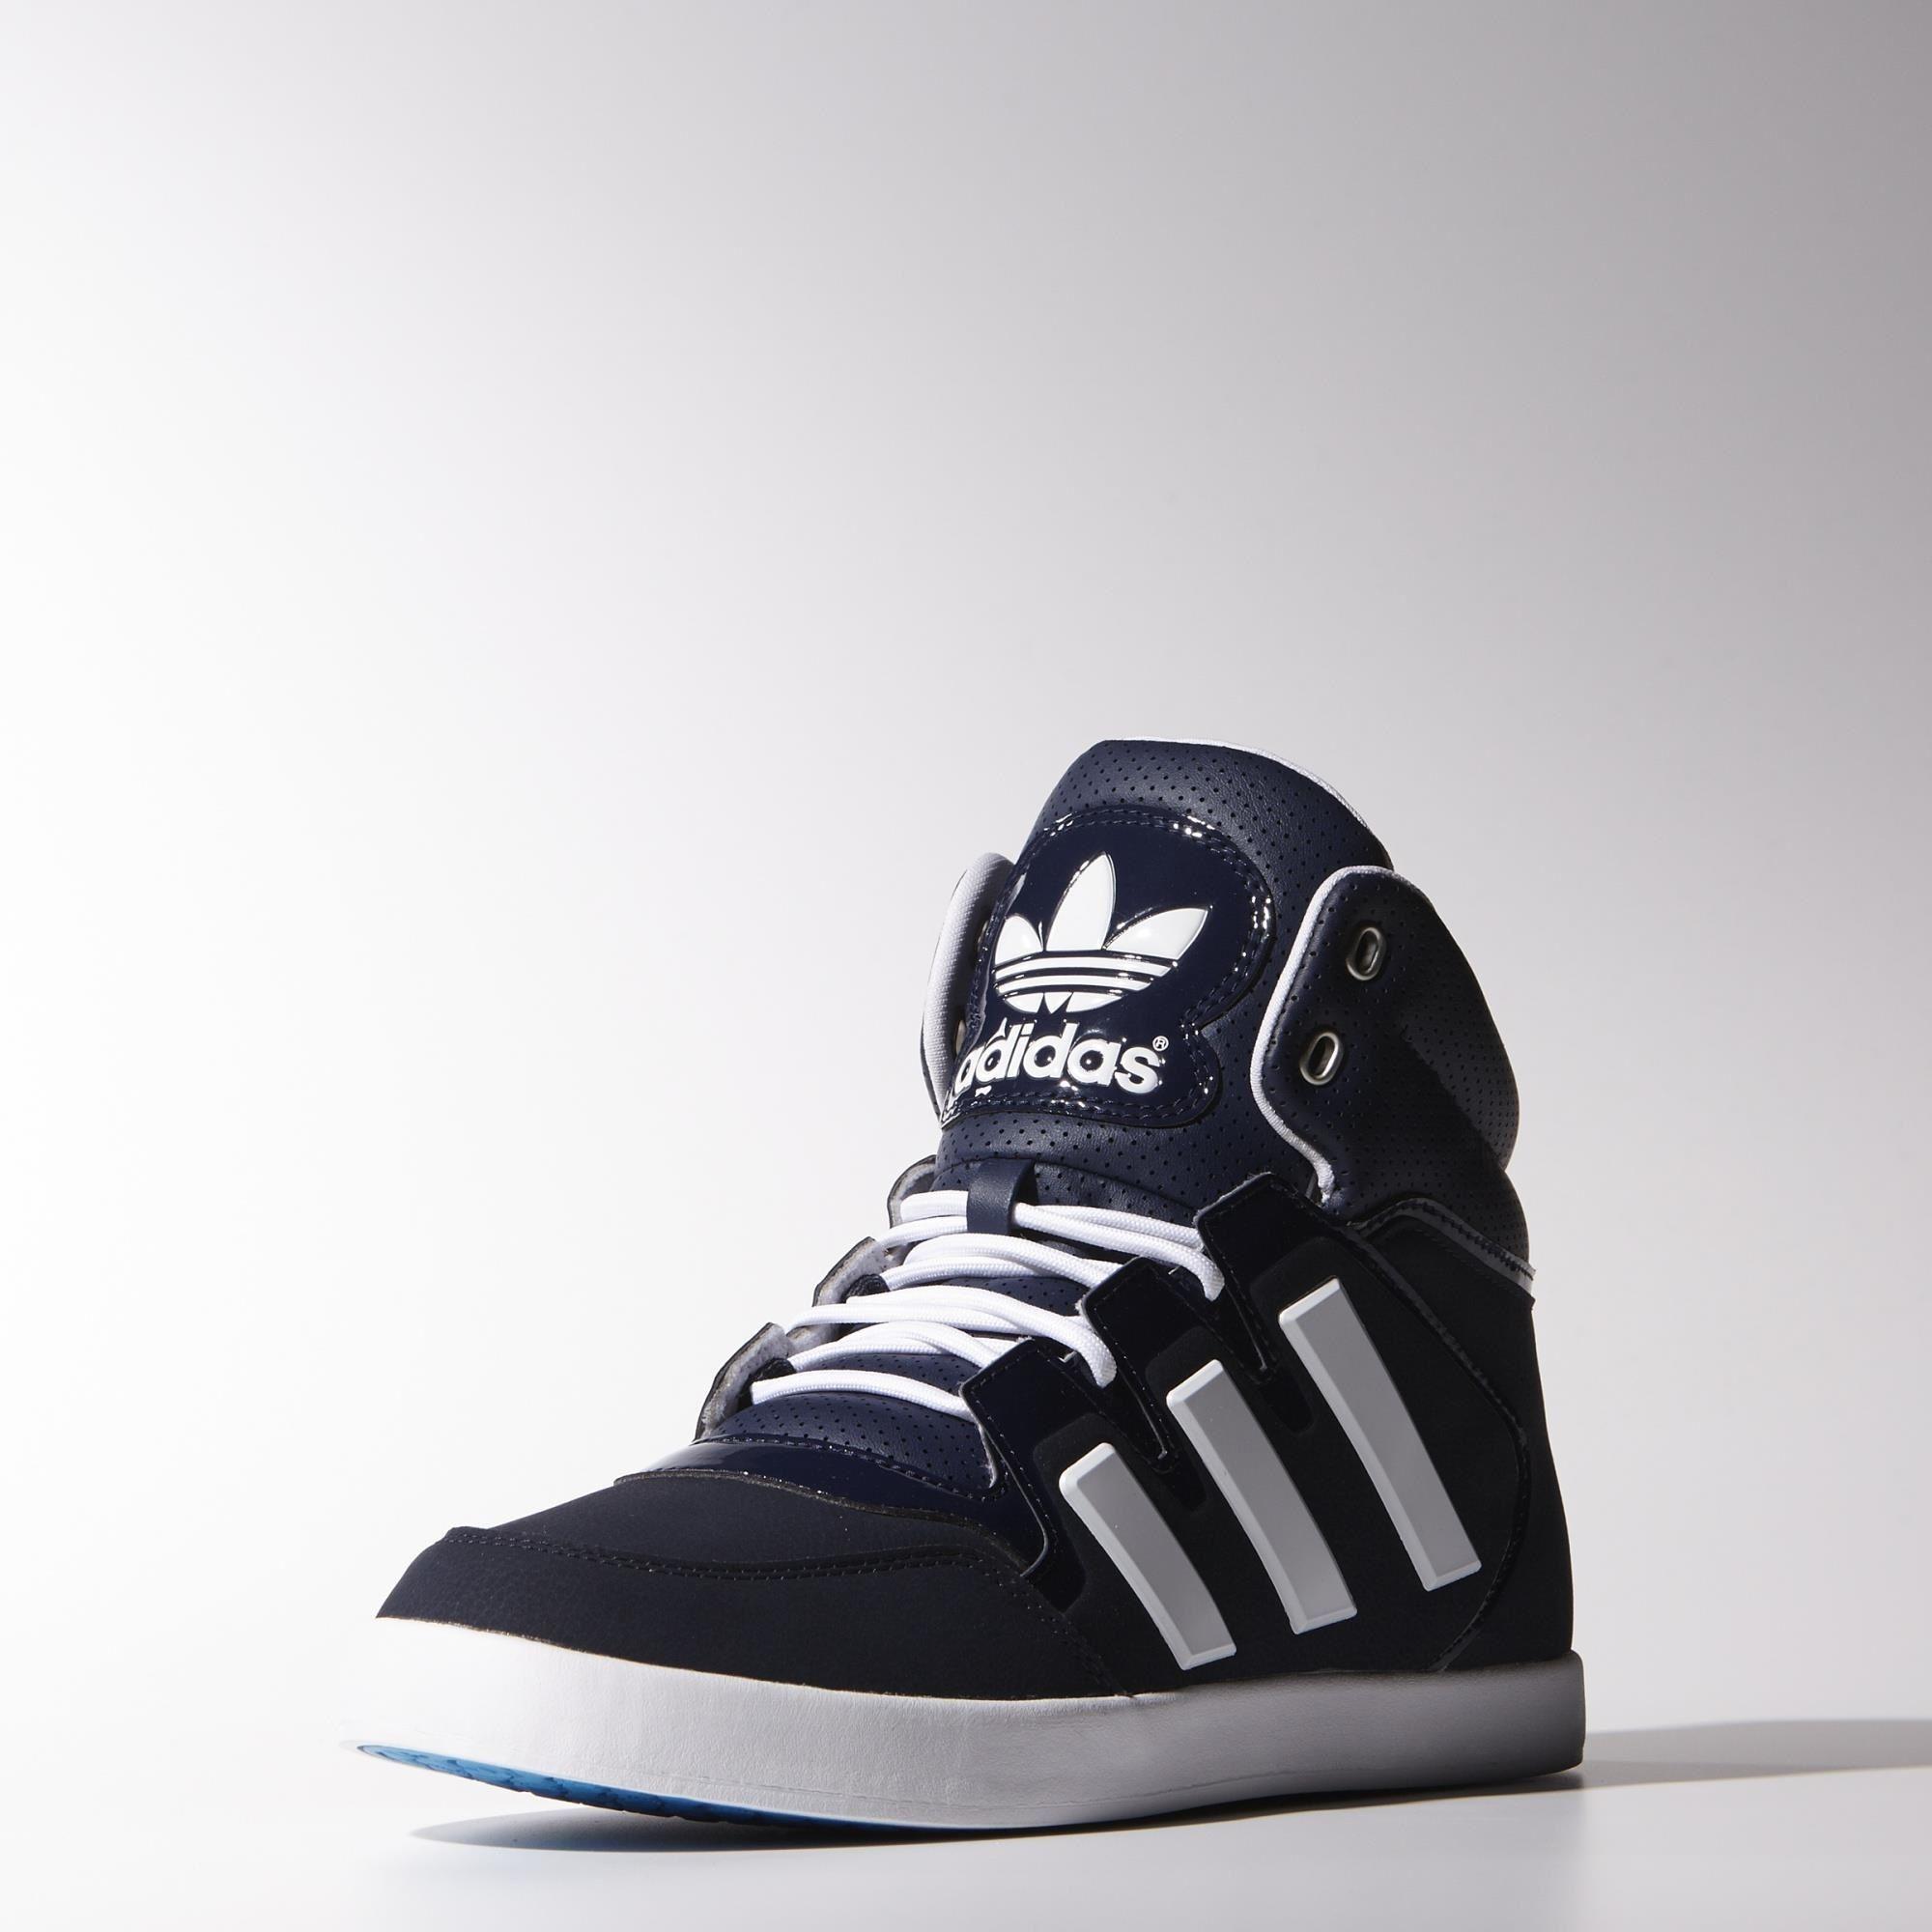 meet 9cd28 174a8 Adidas Dropstep Shoes